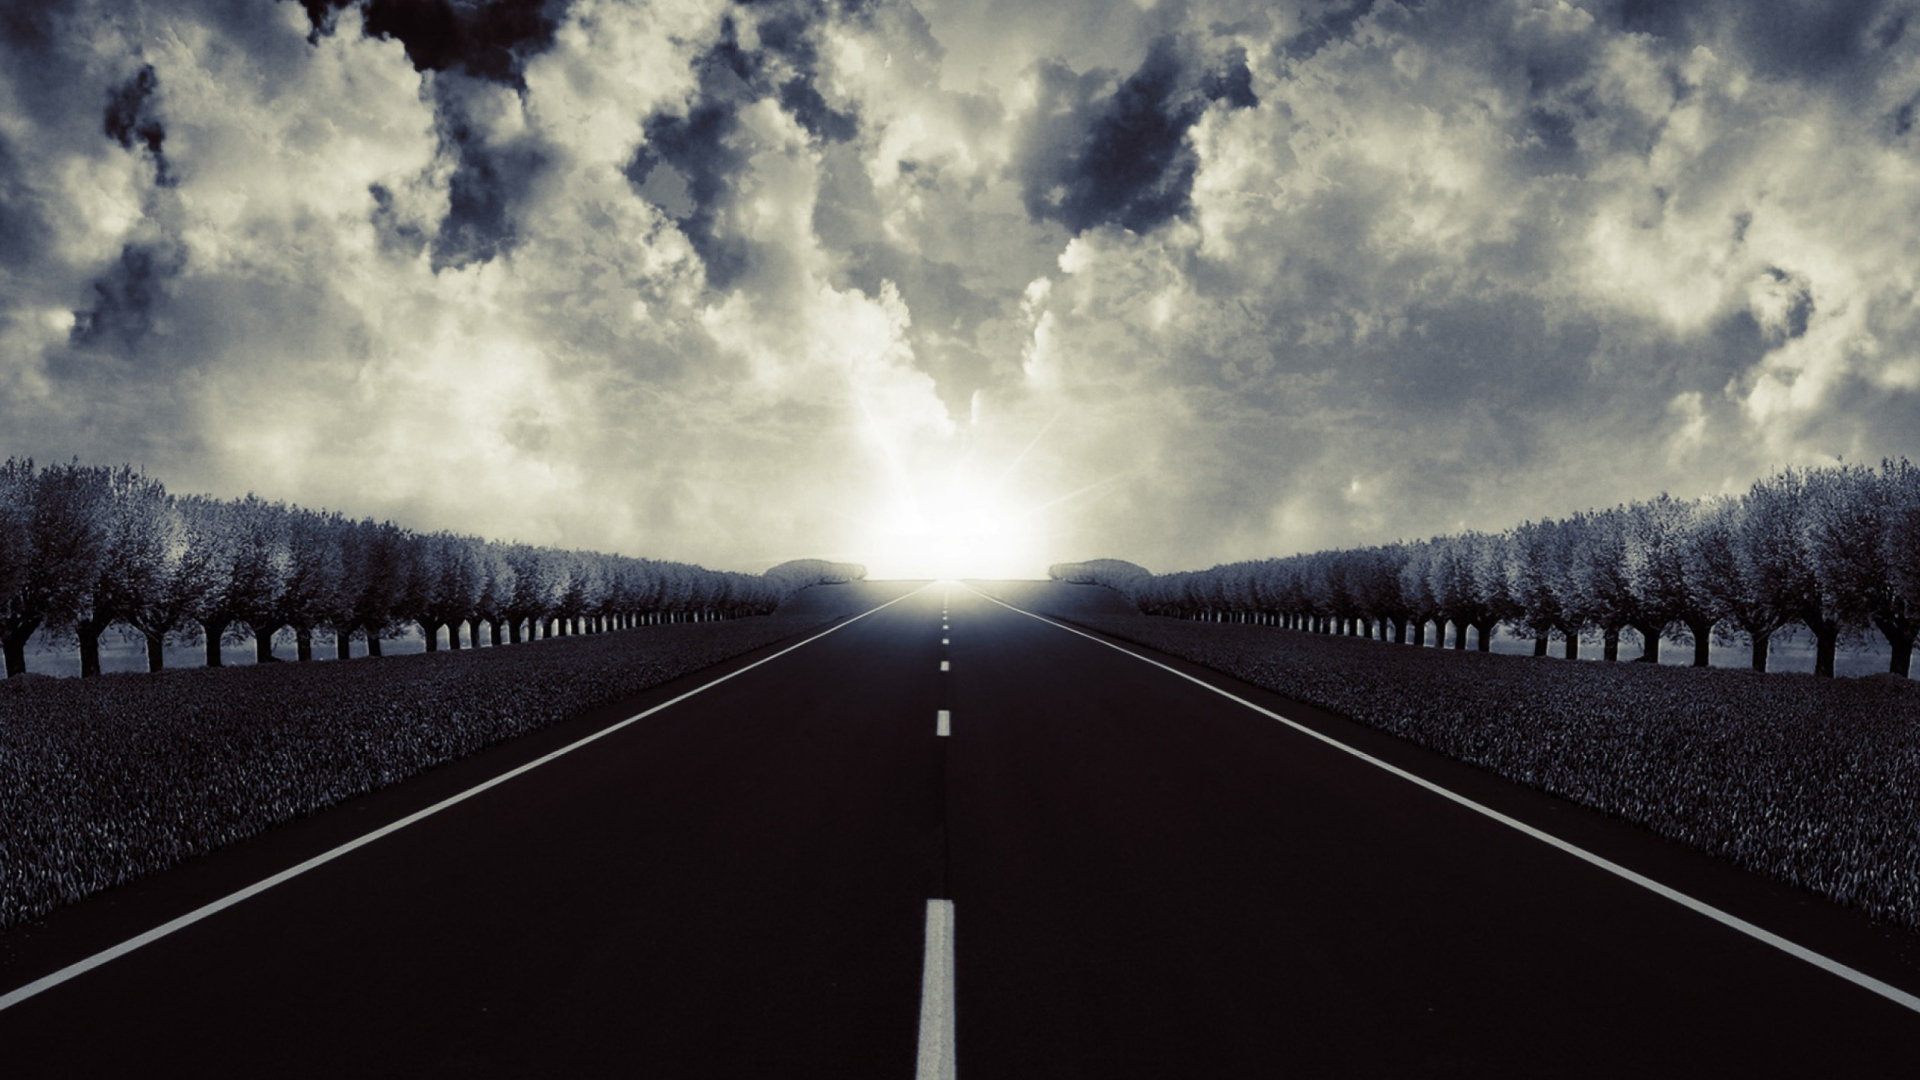 Road to sun sfondi gratuiti per desktop full hd